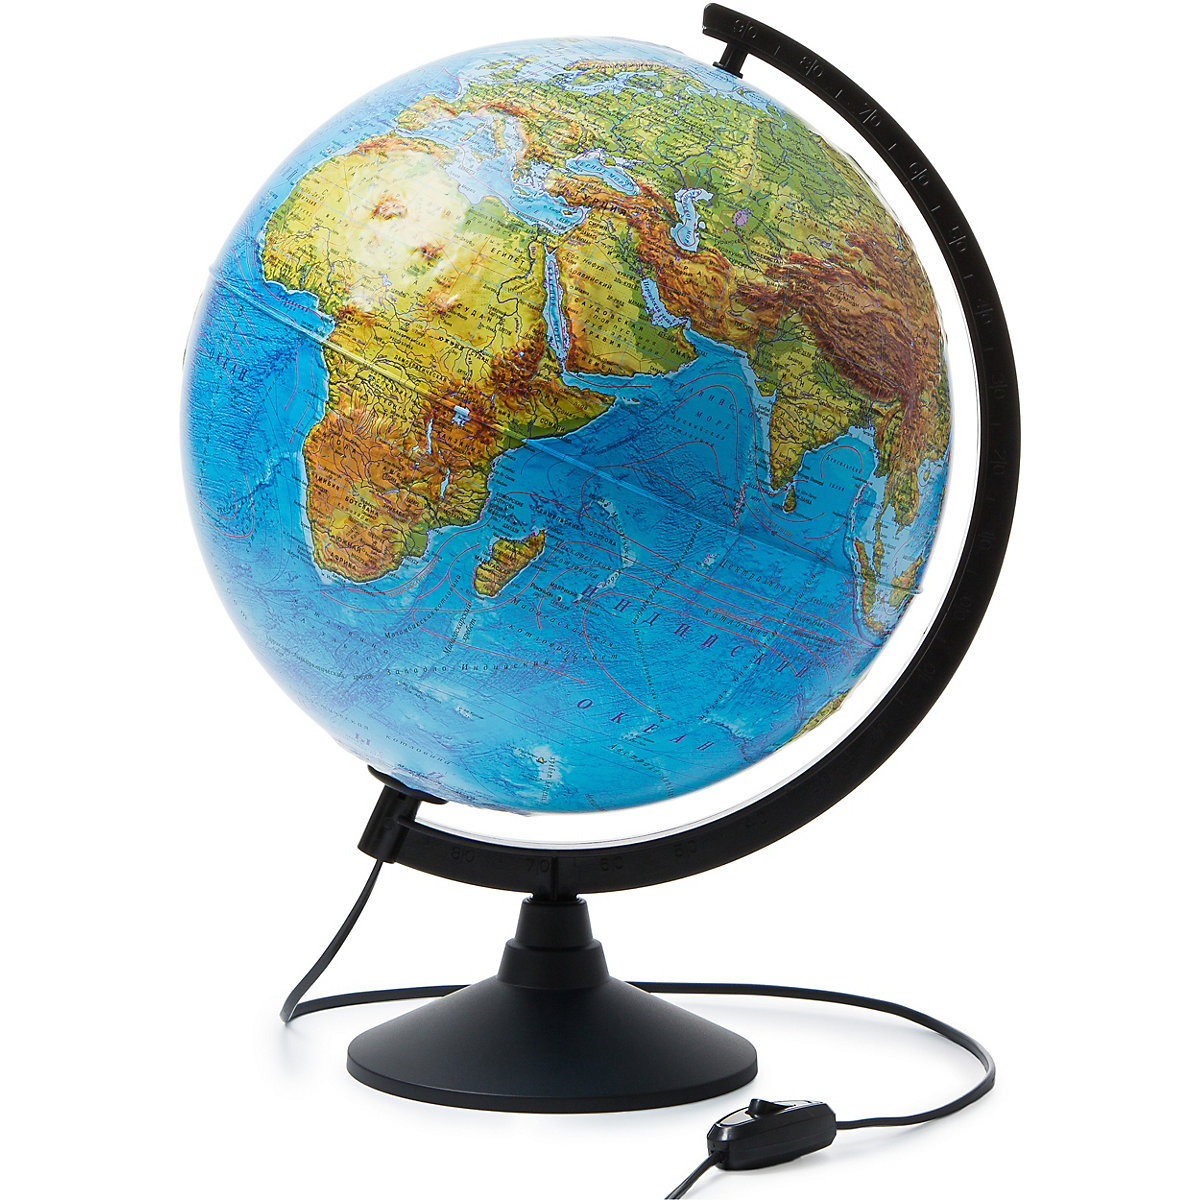 GLOBEN Desk Set 7327219 Globe Accessories Organizer For Office And School Schools Offices MTpromo